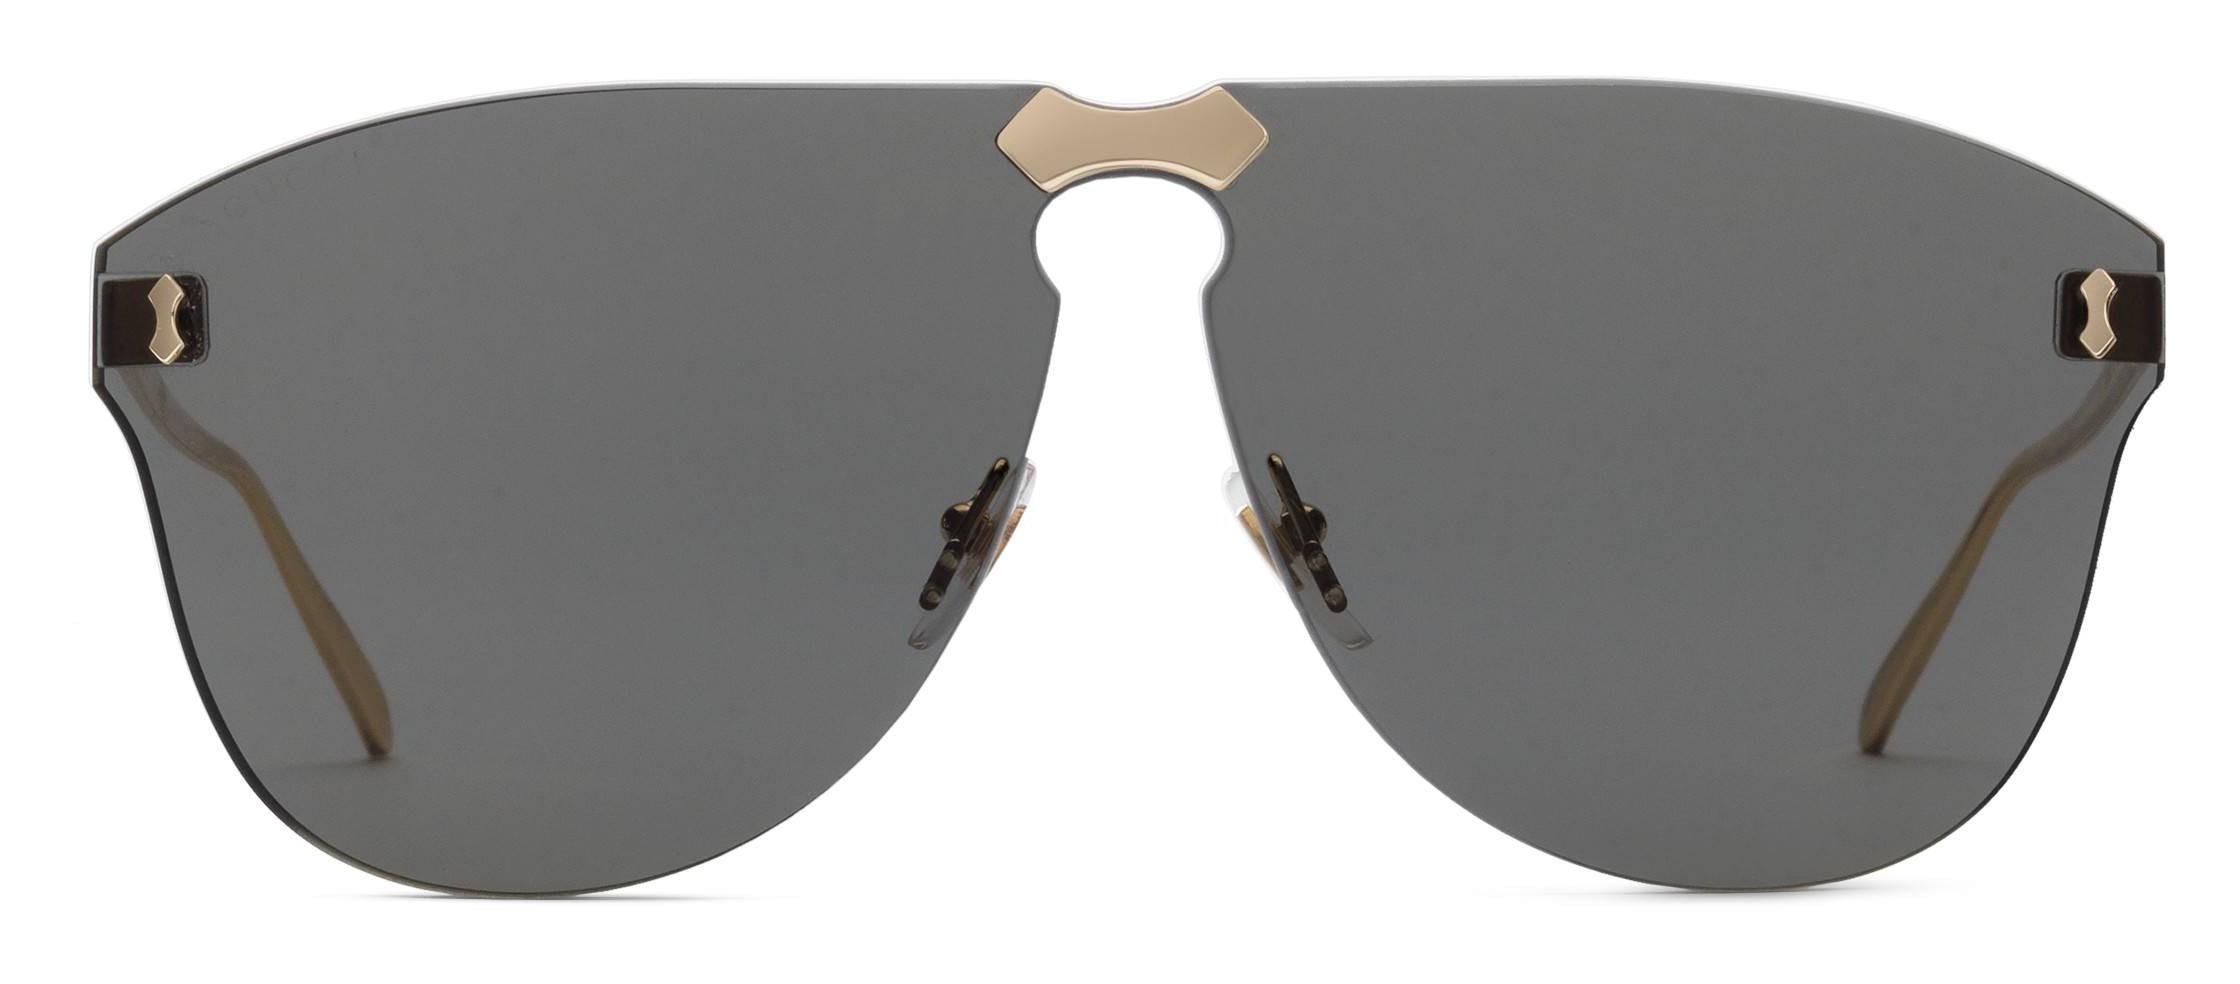 8ce23c4db9 Gucci - Frameless Aviator Sunglasses - Grey Gold Lenses - Gucci Eyewear -  Avvenice